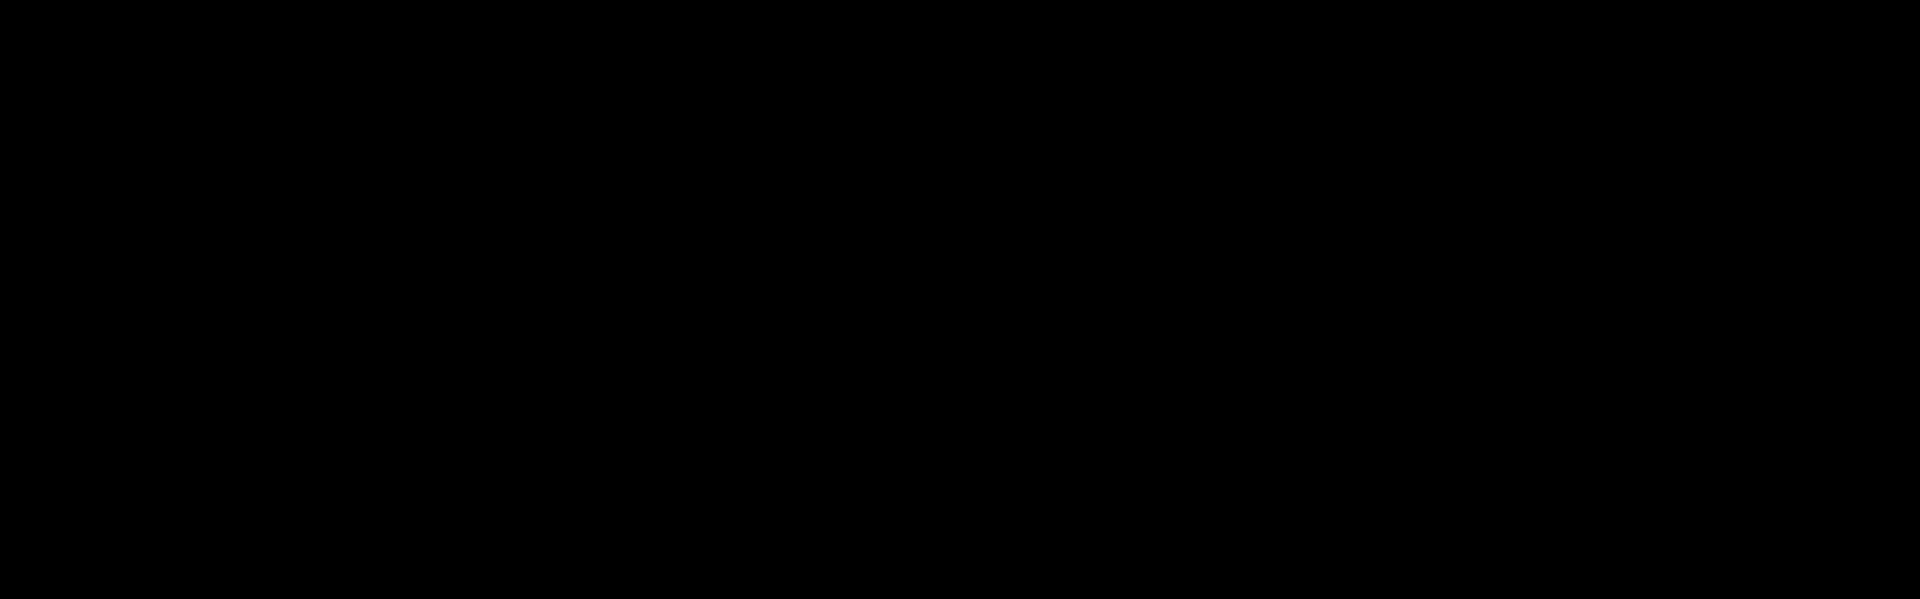 cropped-SIGNATURE-SPIEL-TESTT-RUNNER.png